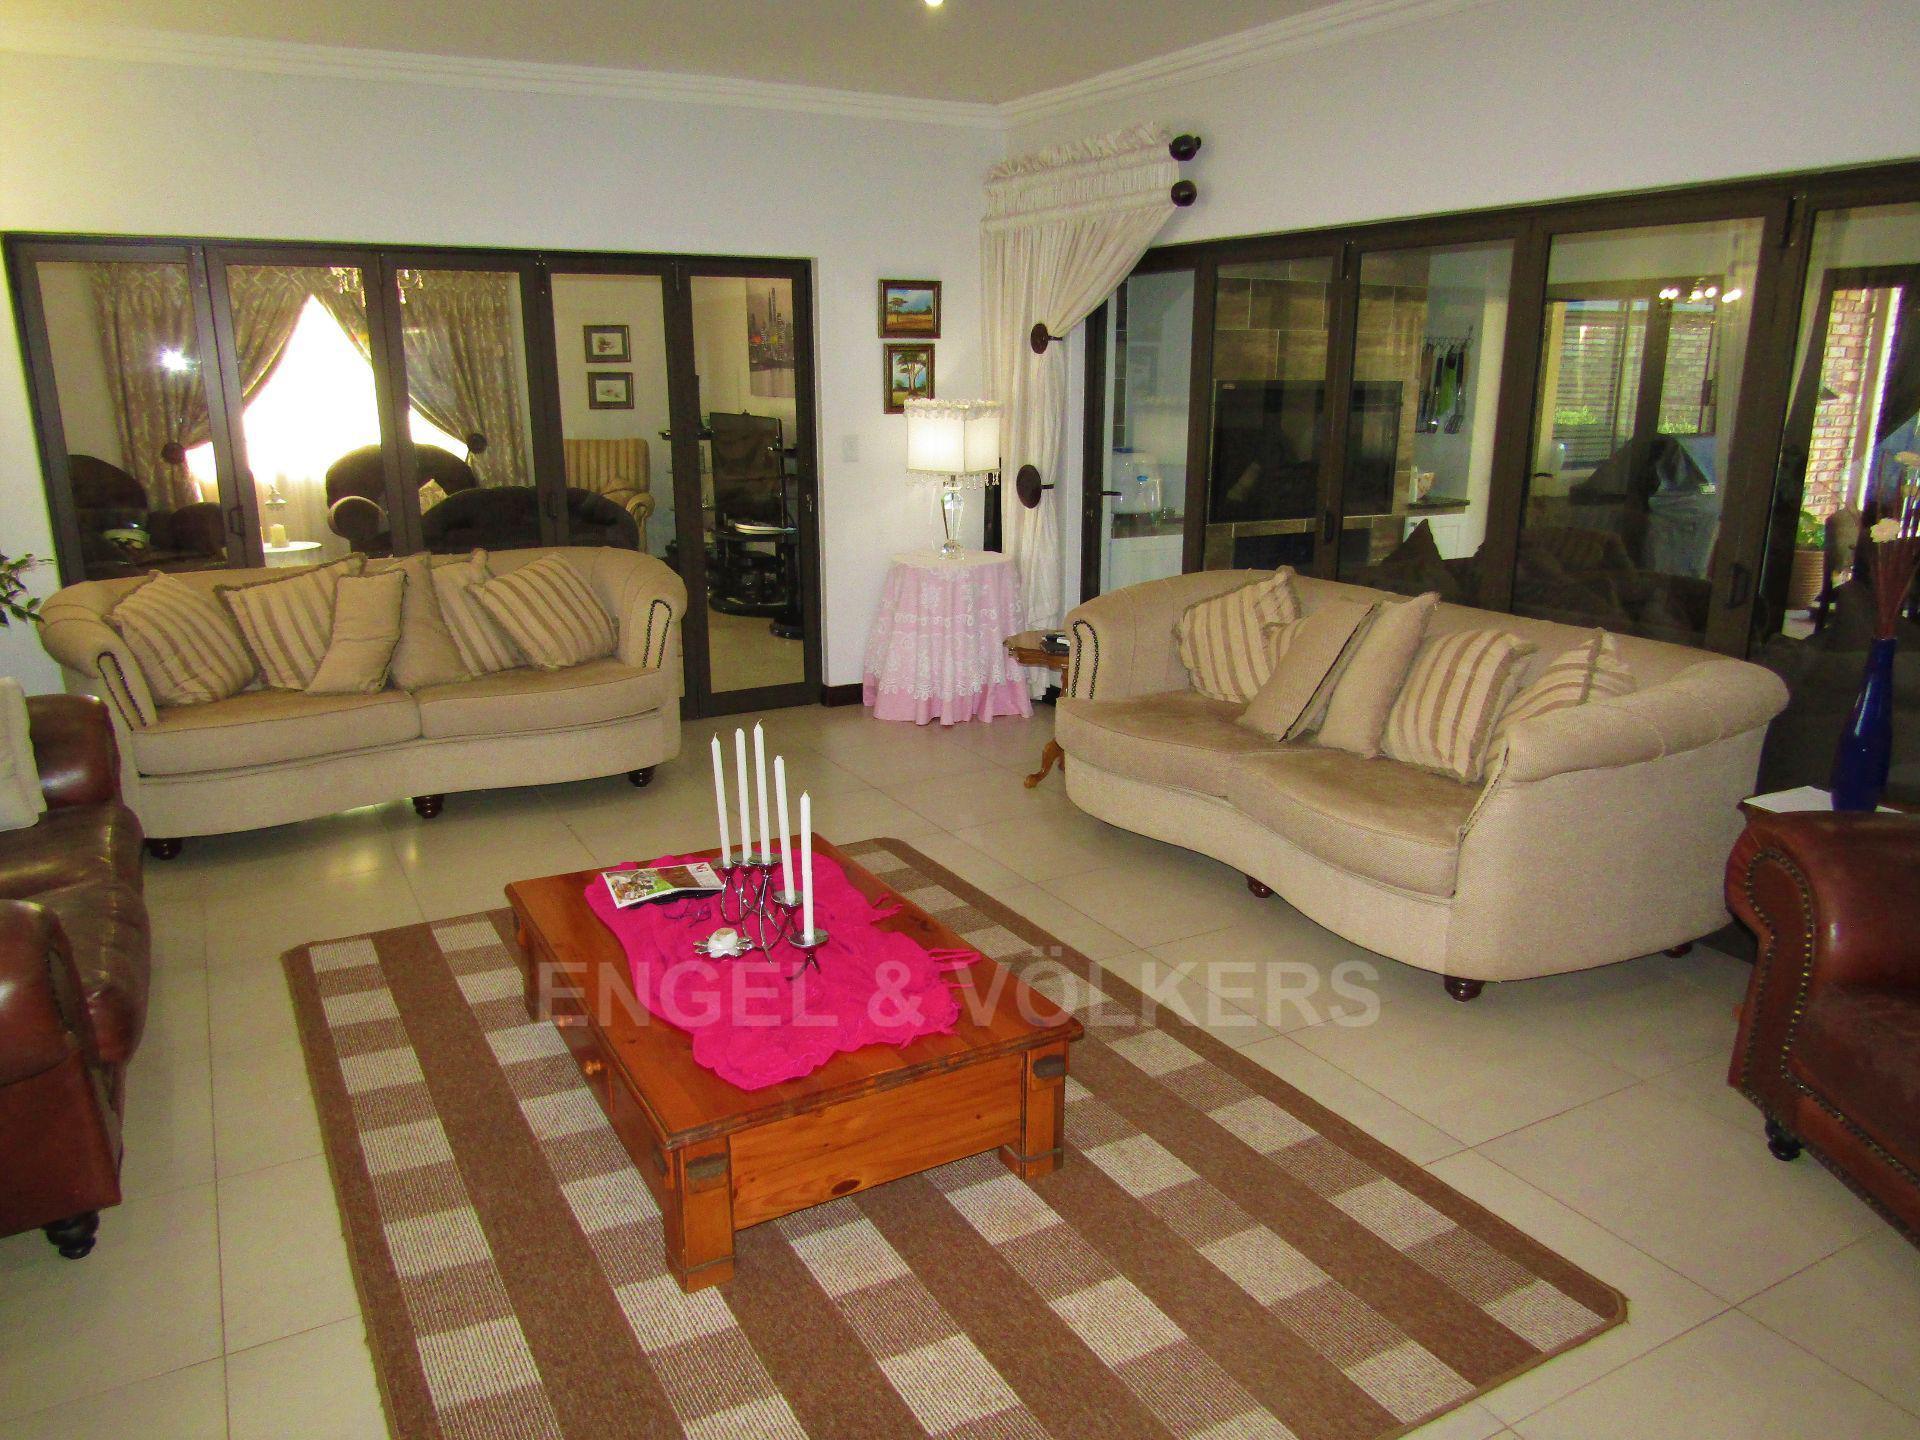 Lifestyle Estate property for sale. Ref No: 13458759. Picture no 4